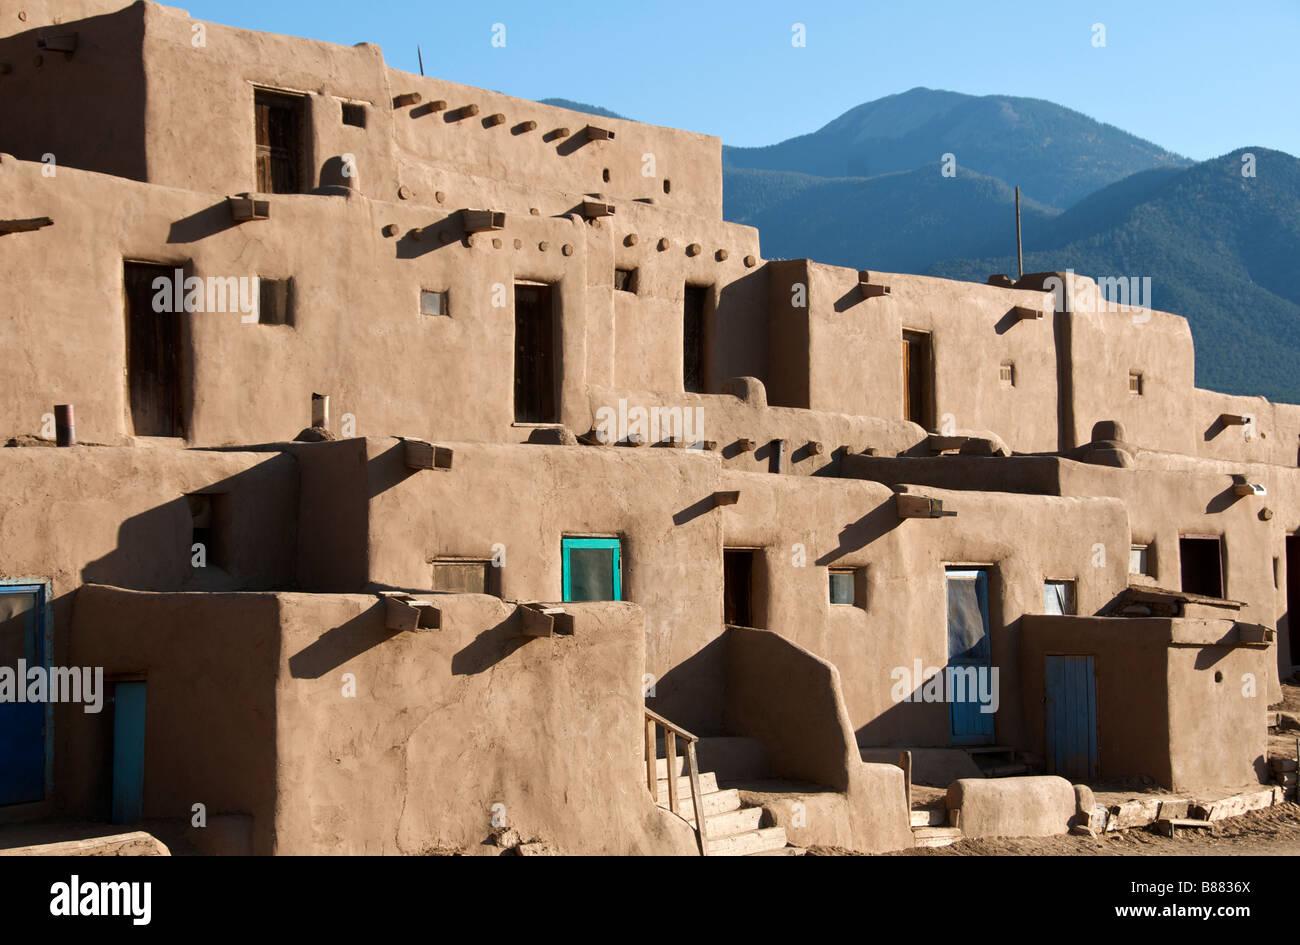 Inhabited adobe houses Taos Pueblo New Mexico USA - Stock Image